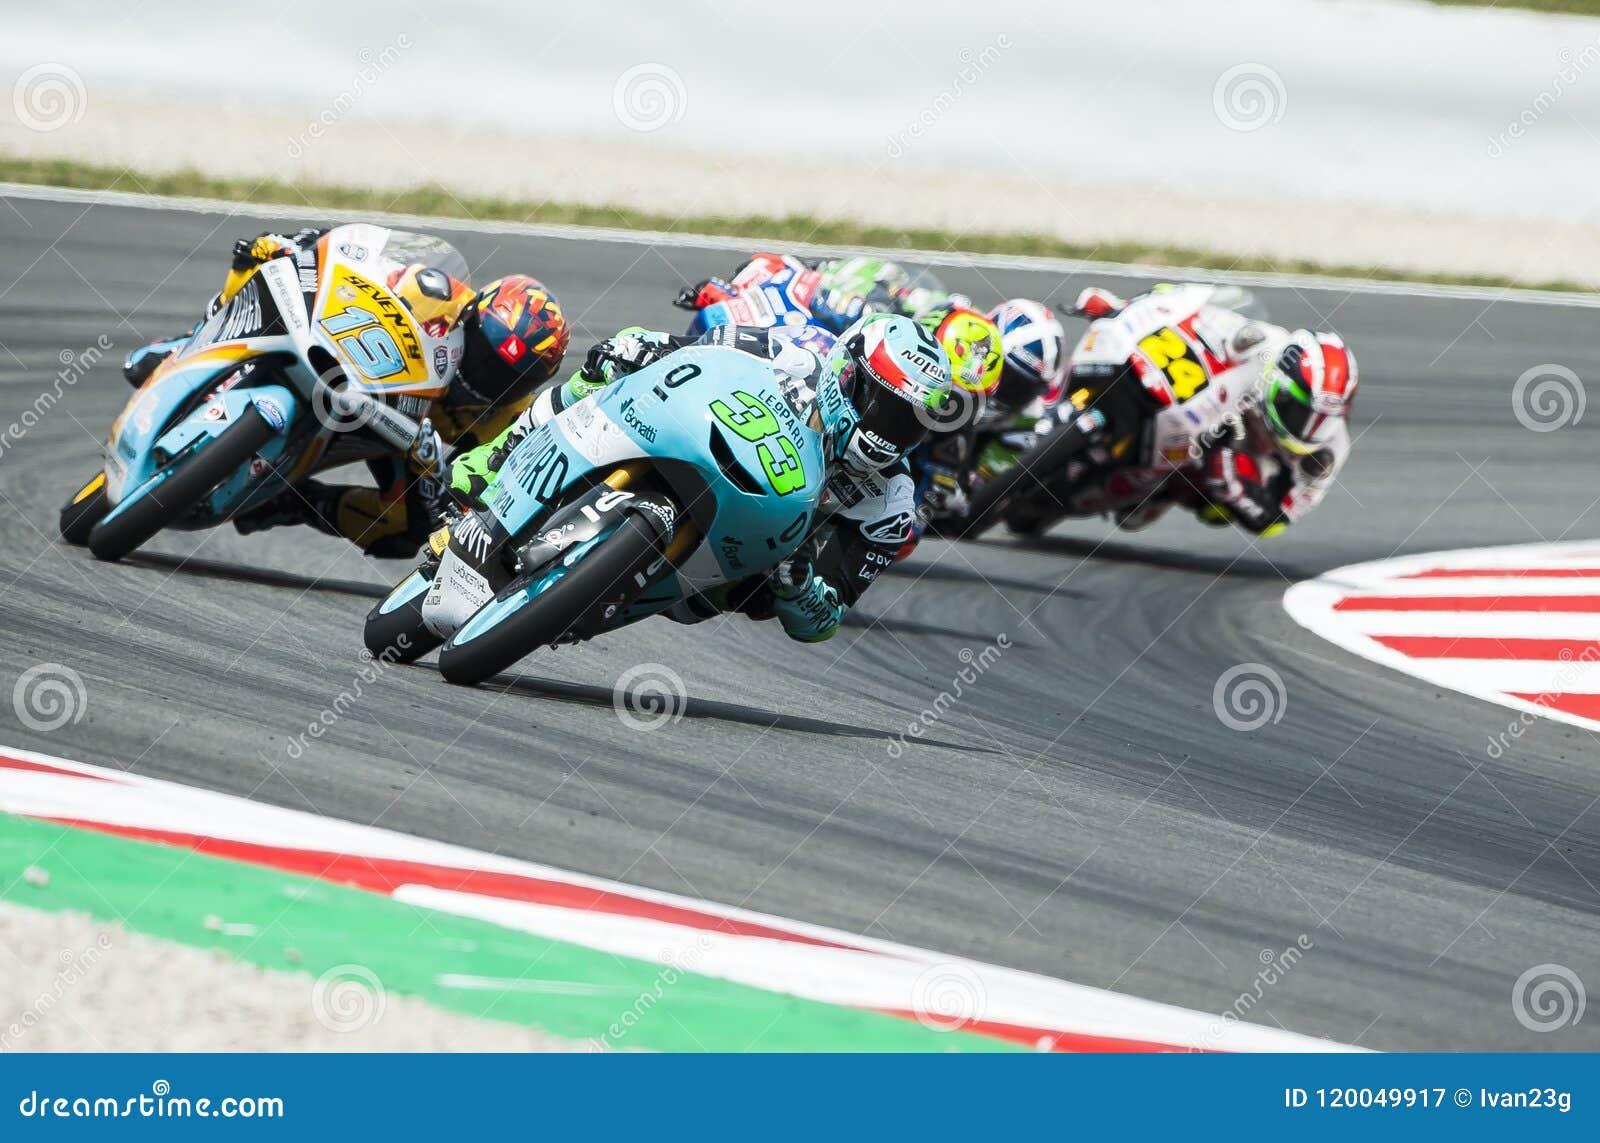 Gp Catalunya Motogp 2018 Editorial Photography Image Of Event